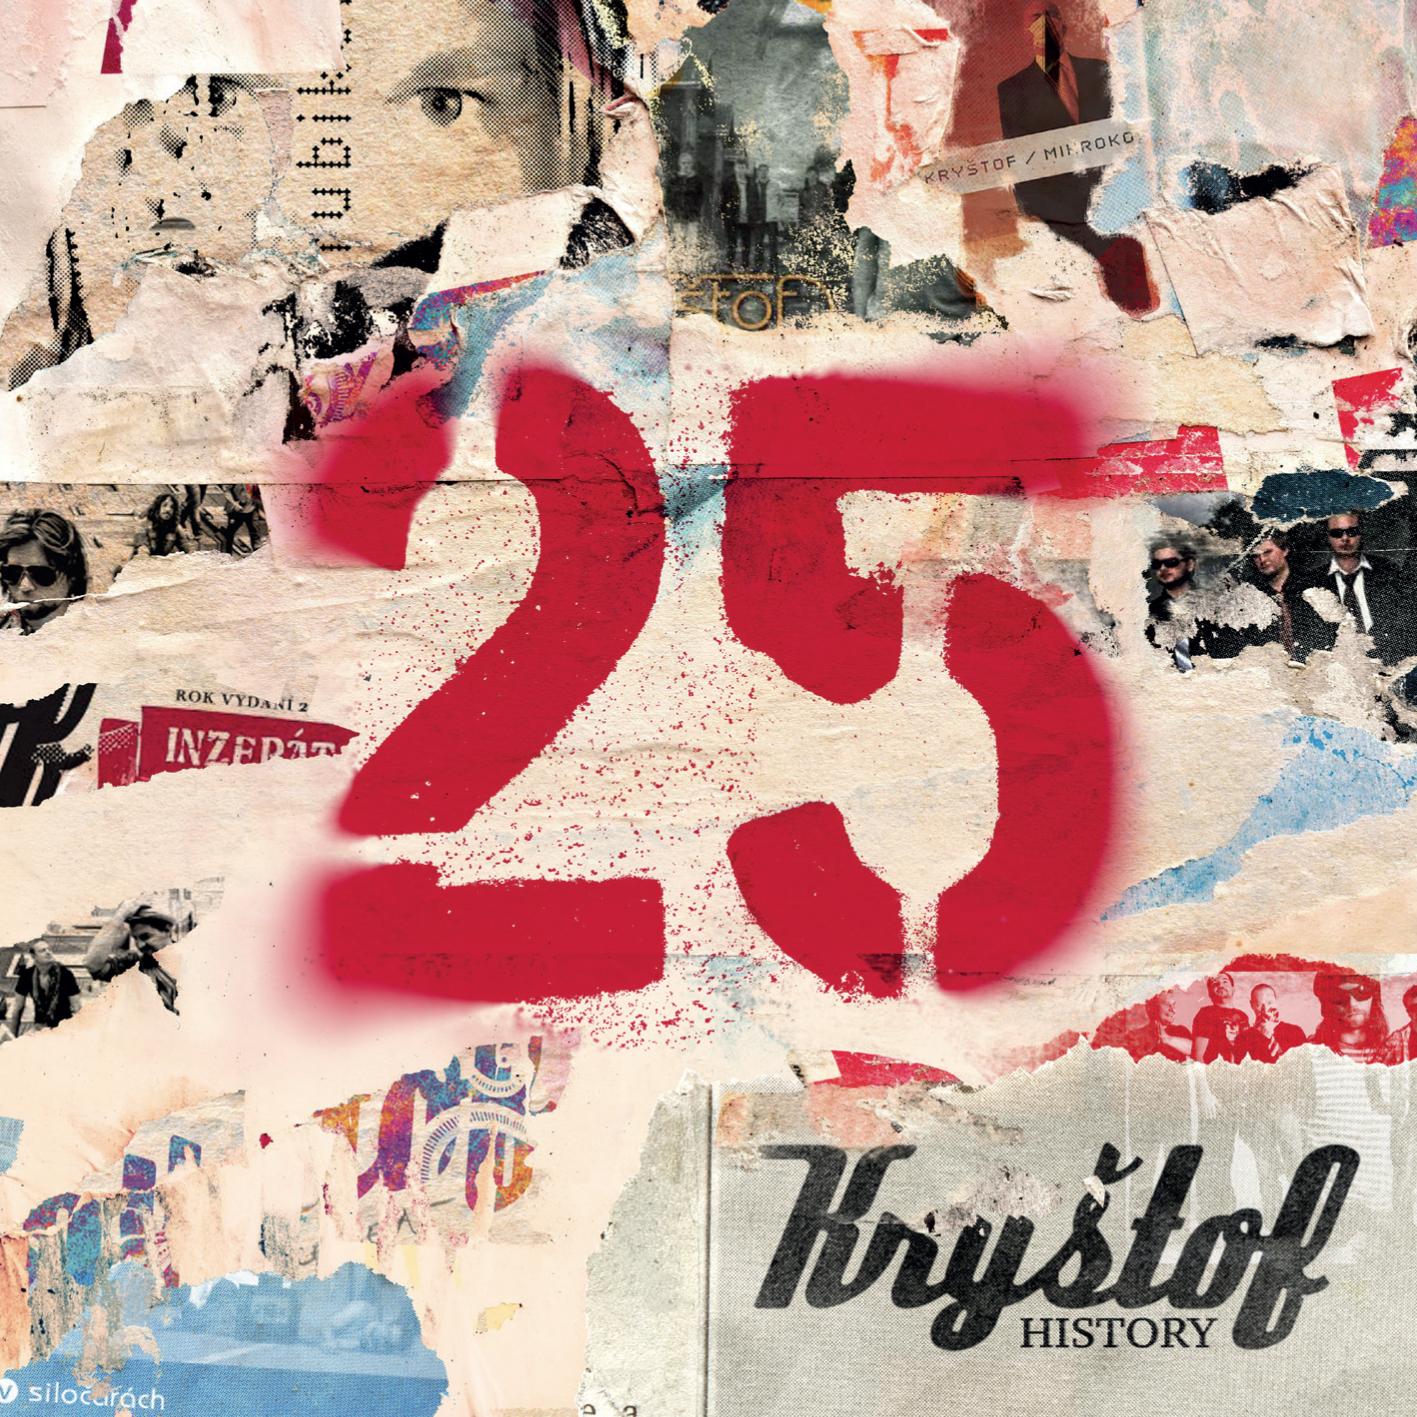 CD Shop - KRYSTOF 25 (History)